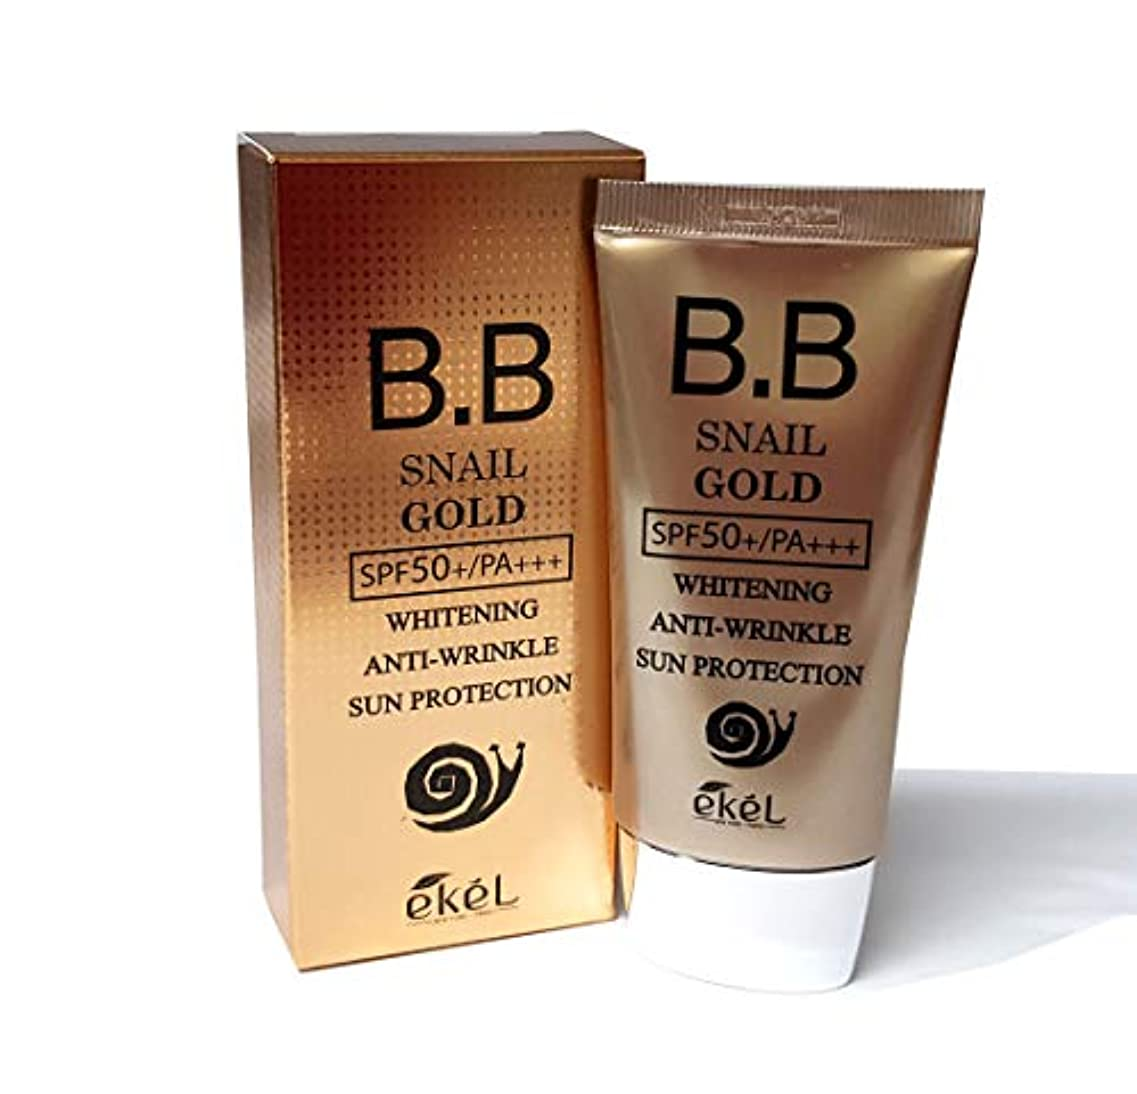 [Ekel] カタツムリゴールドBB 50ml SPF50 + PA +++ / Snail Gold BB 50ml SPF50+PA+++ /ホワイトニング、UVカット/Whitening,UV protection...